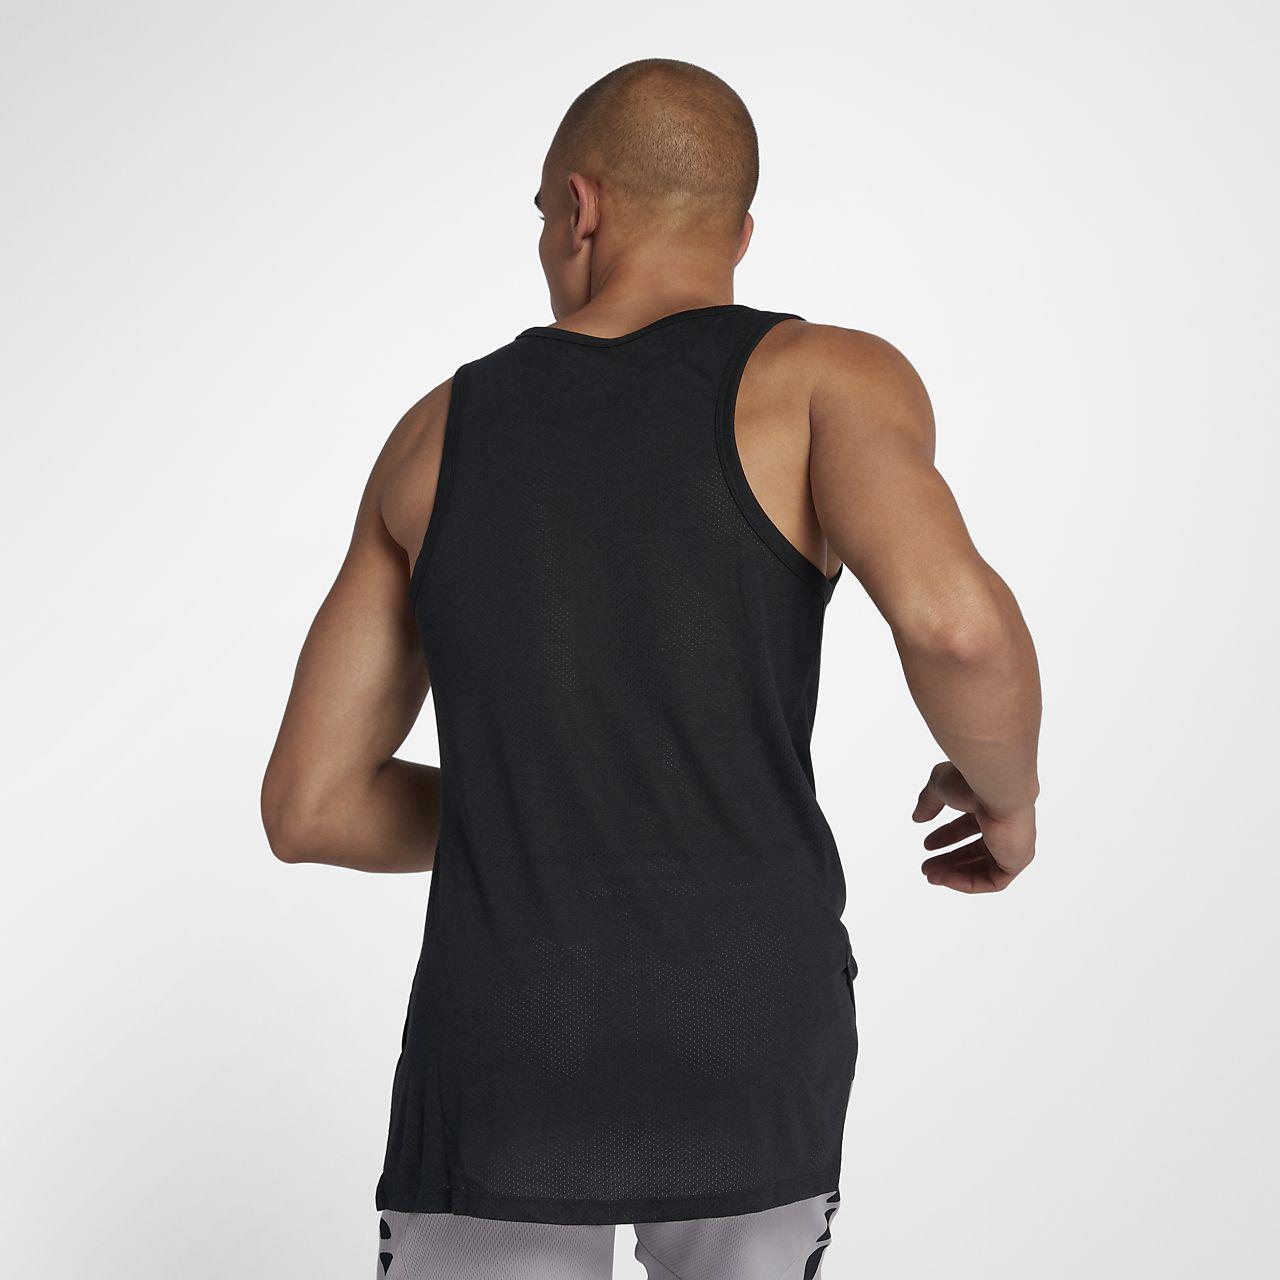 714c3a19 Nike Breathe Elite Men's Sleeveless Basketball Top. Nike.com ZA